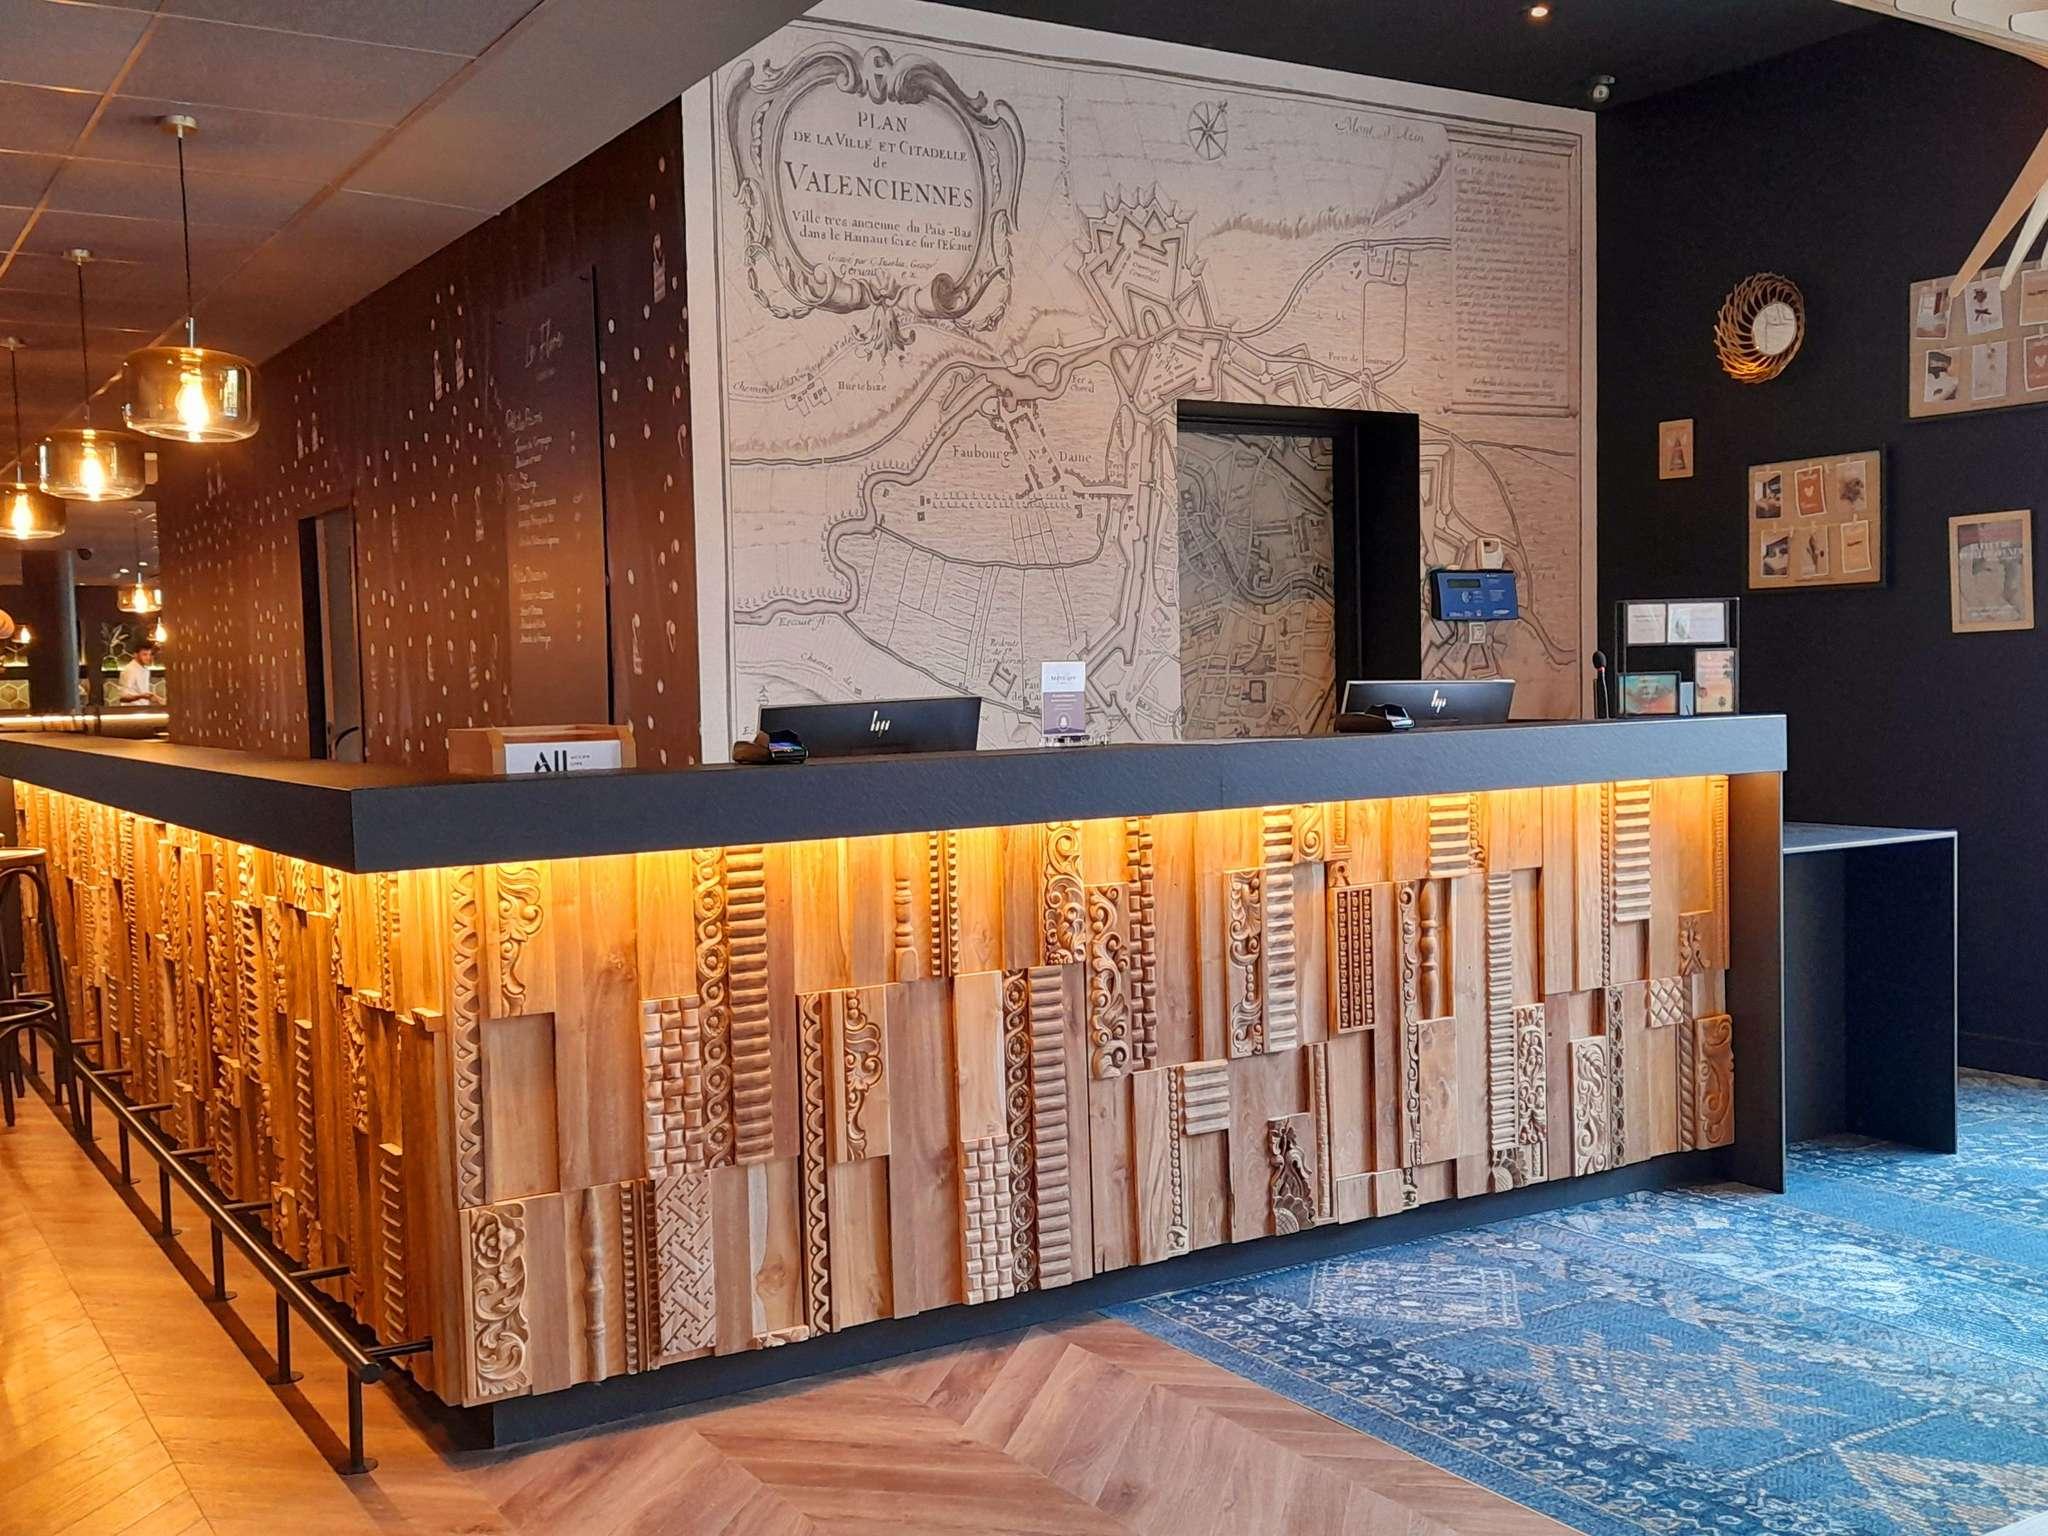 Hotel – Hotel Mercure Valenciennes Centre